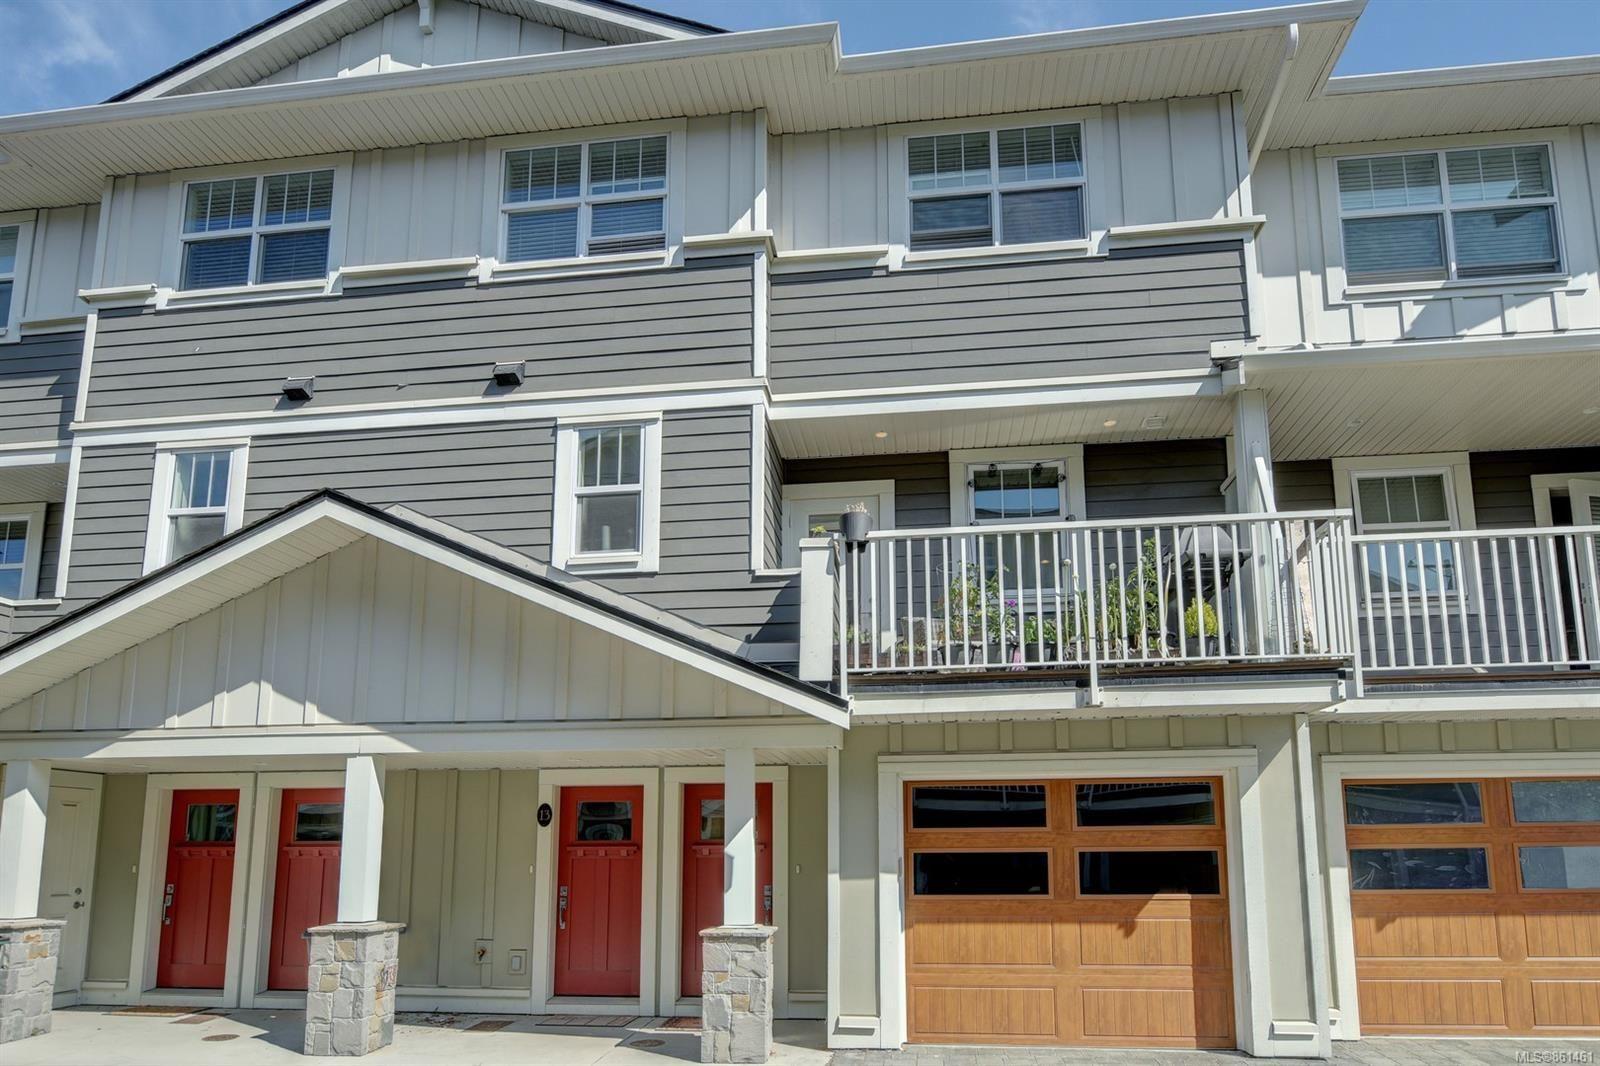 Main Photo: 13 3356 Whittier Ave in Saanich: SW Rudd Park Row/Townhouse for sale (Saanich West)  : MLS®# 861461